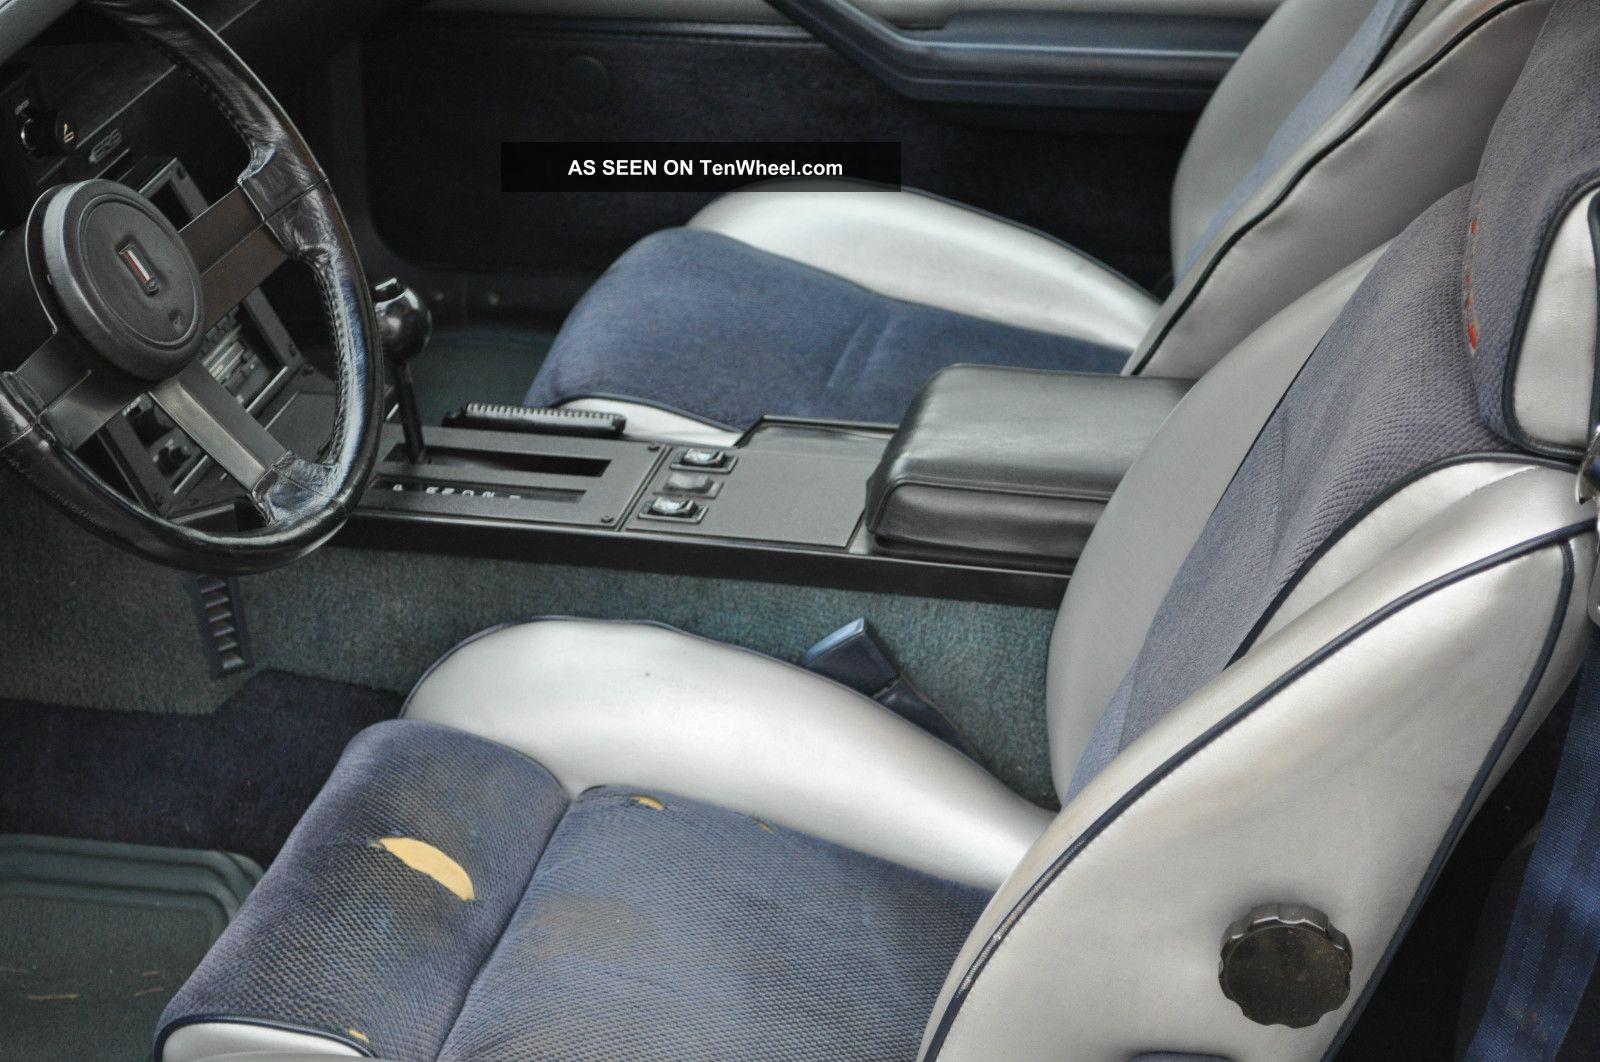 1982 camaro indy pace car 63 833. Black Bedroom Furniture Sets. Home Design Ideas